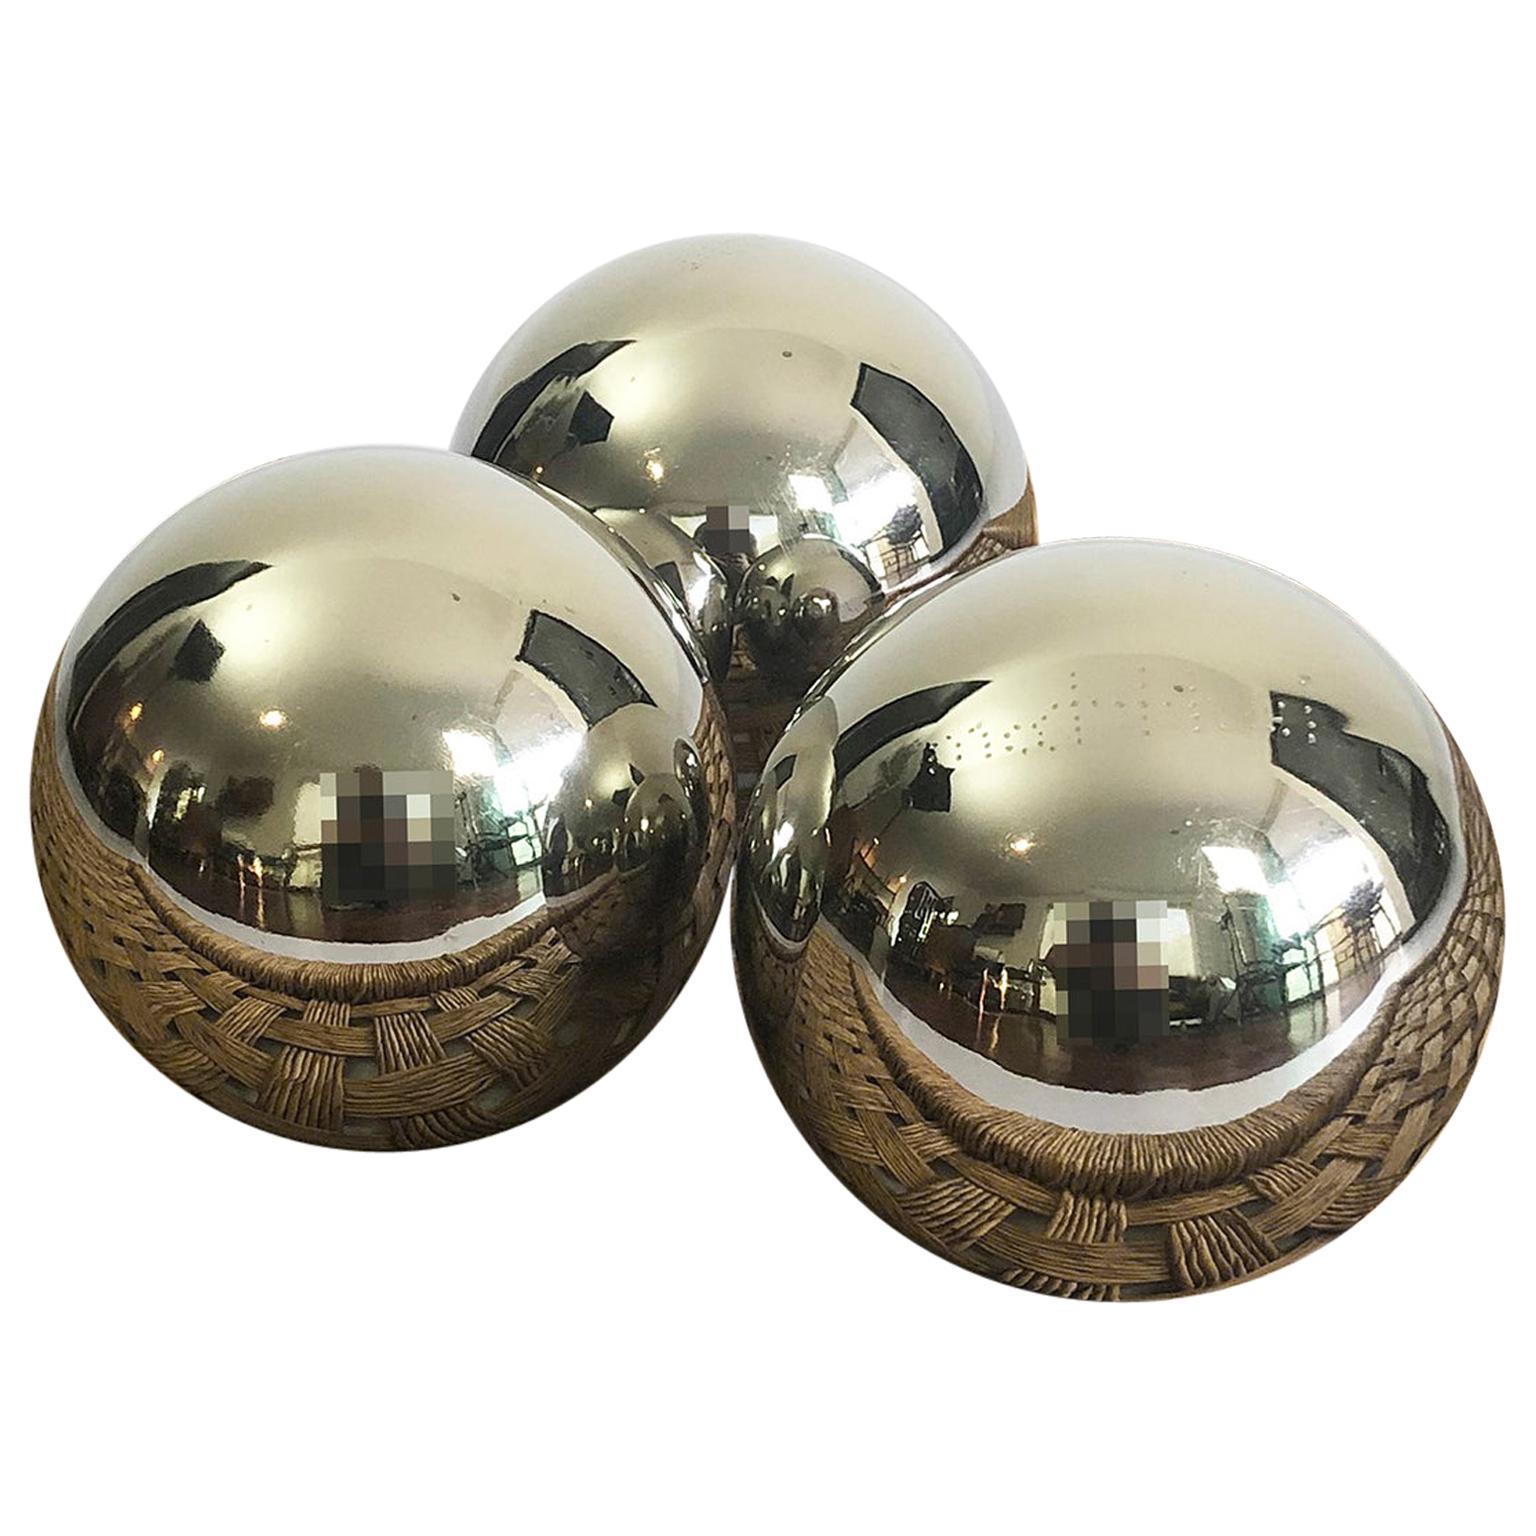 Set of Three Spheres circa 1990 Chromed Metal by Diego Matthai